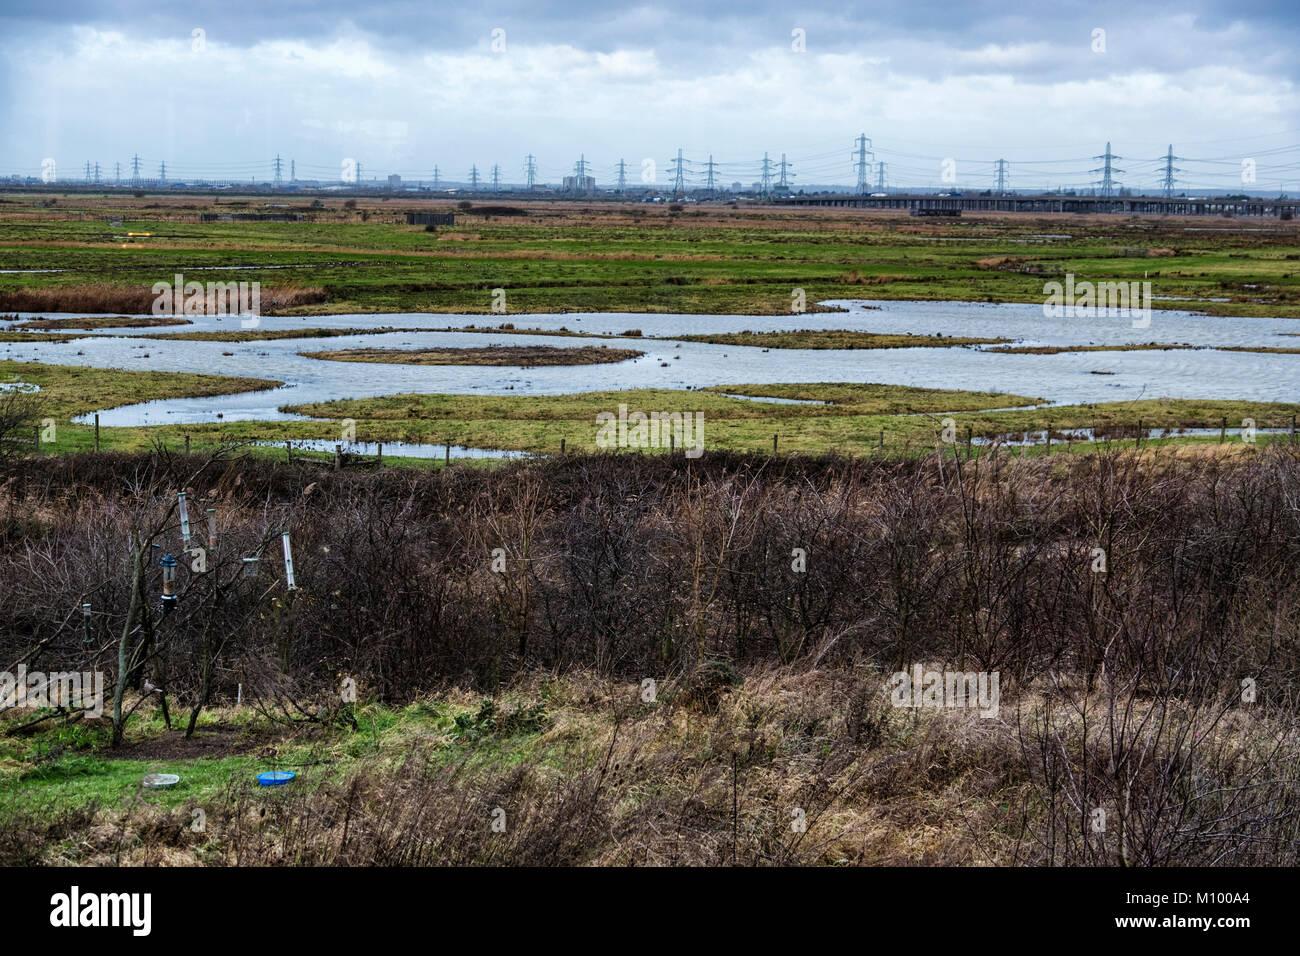 Rainham Marshes RSPB nature reserve next to Thames Estuary in Purfleet, The large wetland Bird sanctuary is a site Stock Photo